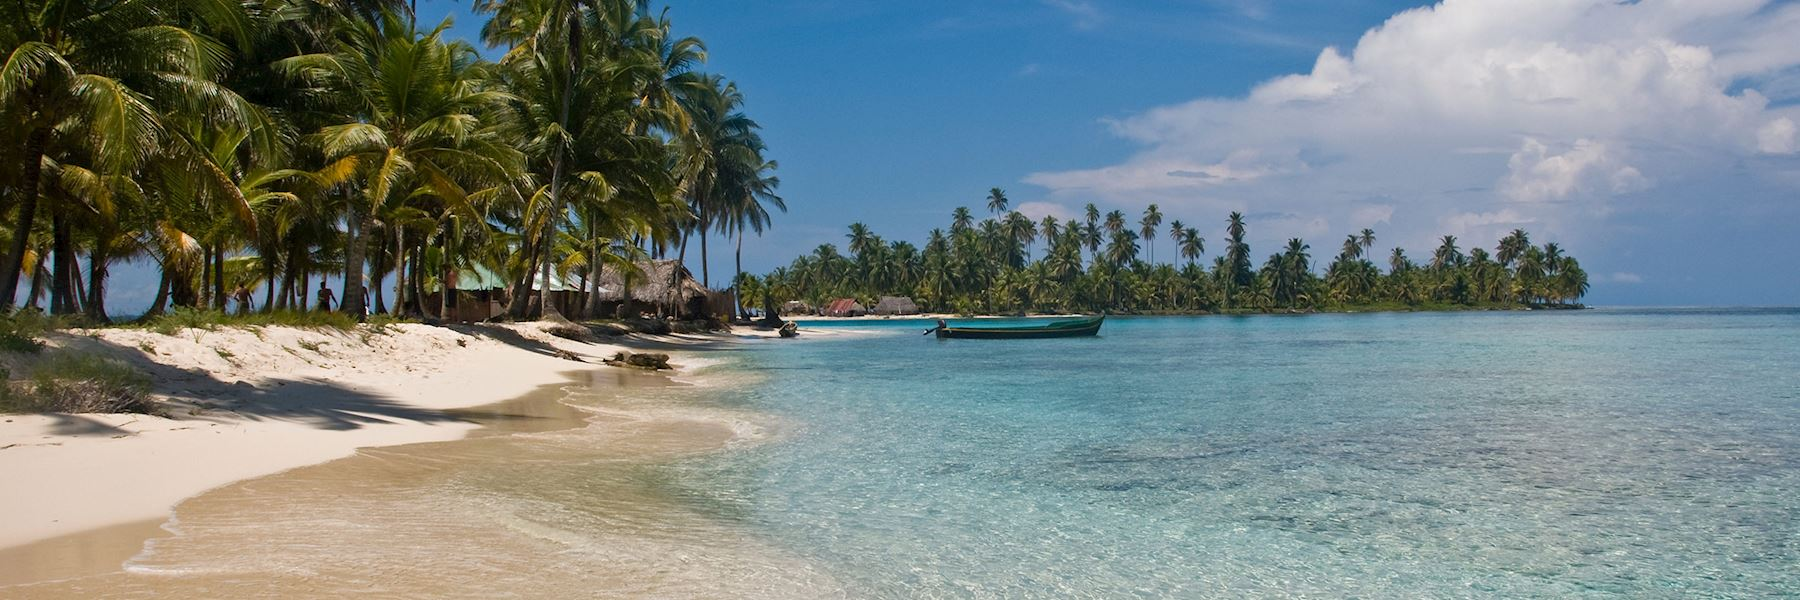 Panama Trip Ideas